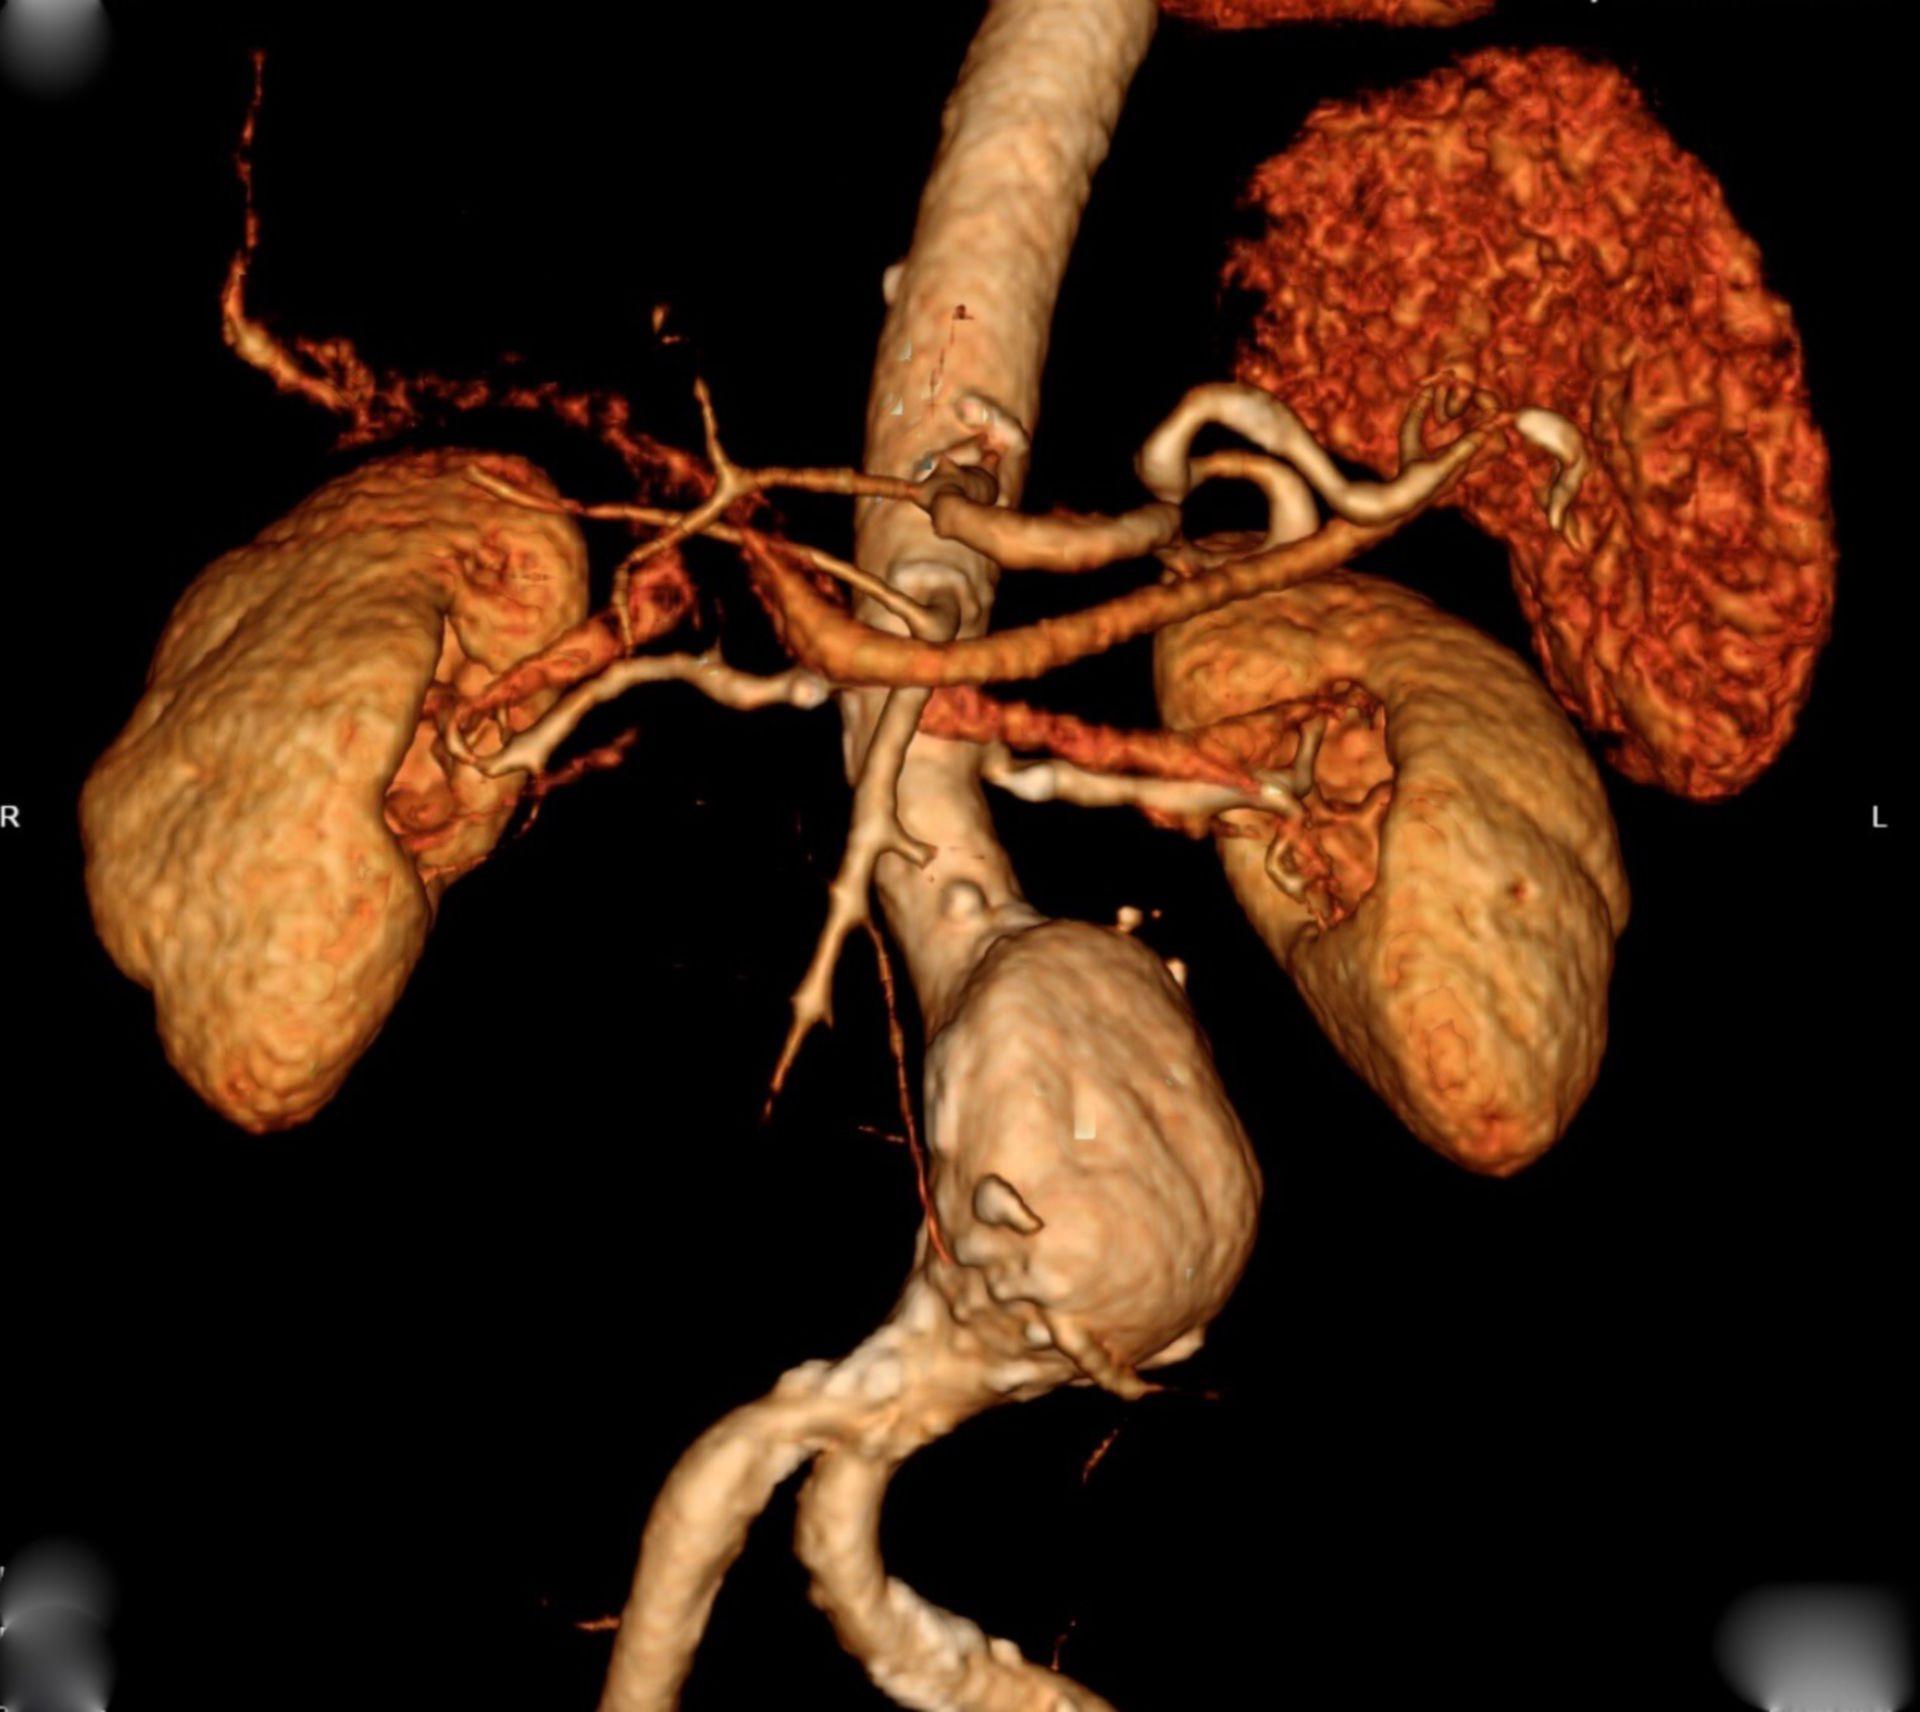 Abdominelles Aortenaneurysma